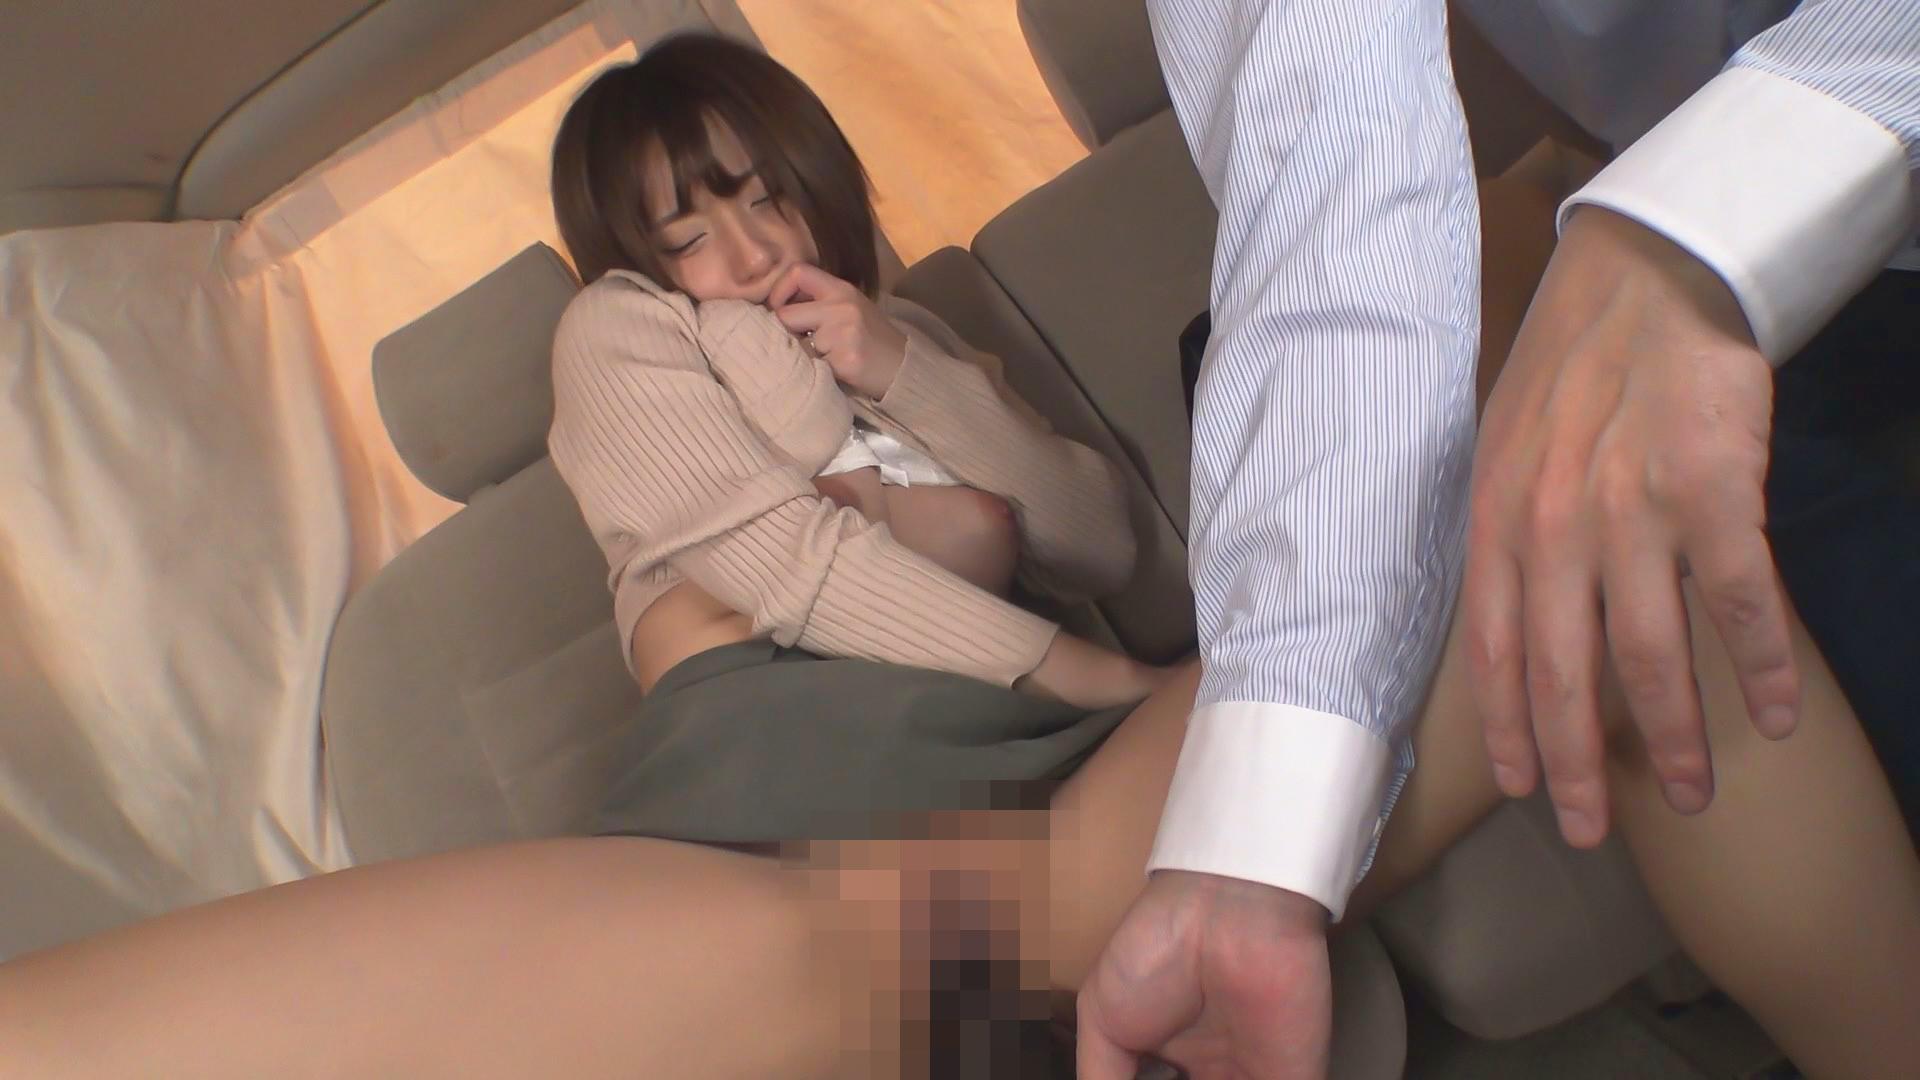 M性若妻 感度の良い美乳と騎乗位の腰使いが精子抜きにくる